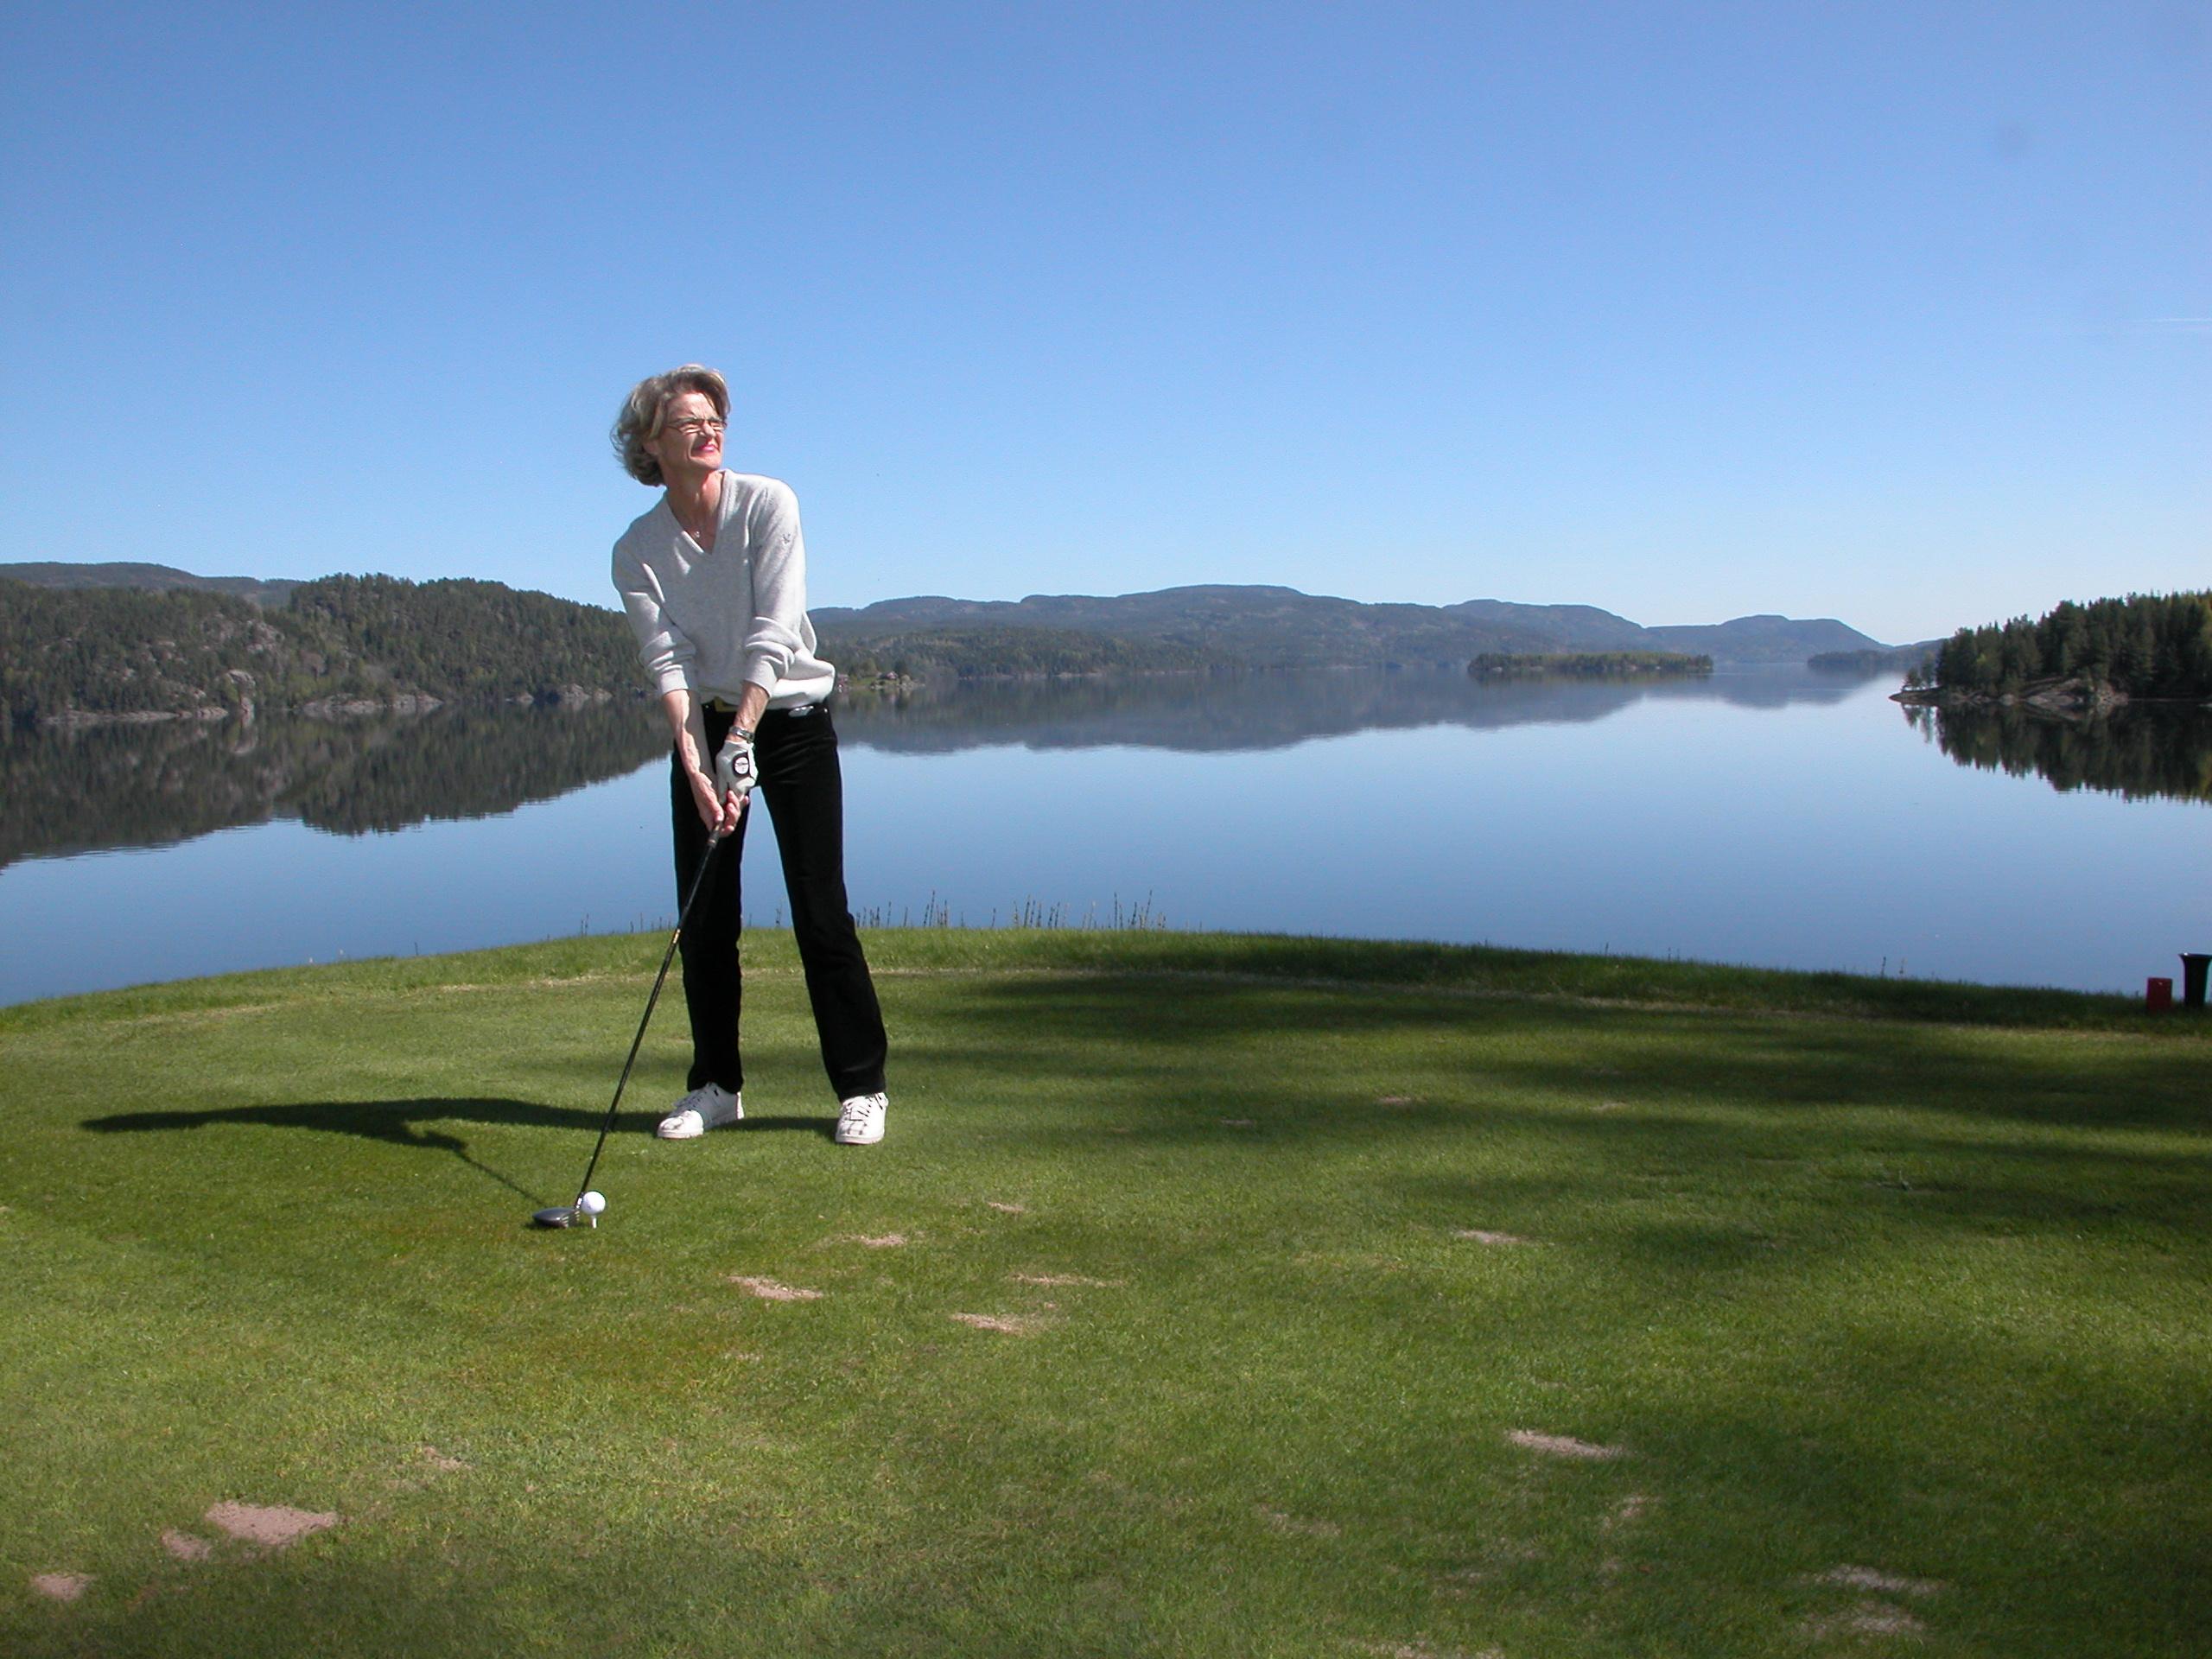 Norsjø Golfpark ligg idyllisk til ved Norsjø, kun 20 minutters avstand fra hotellet. , © Norsjø Golfpark